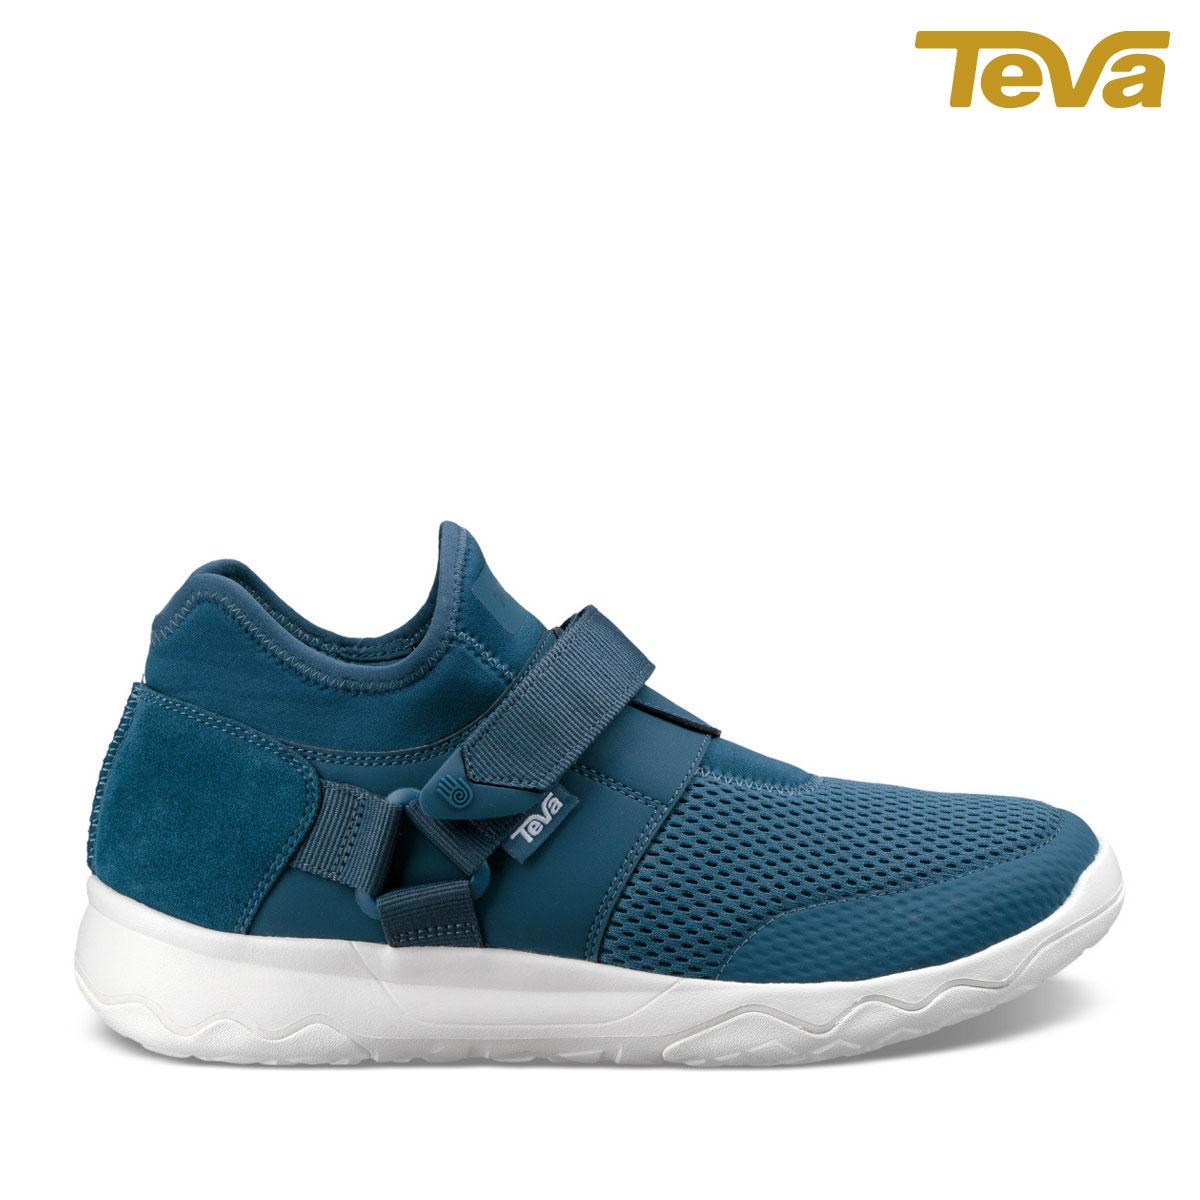 TEVA Arrowood Evo Mesh(LEGION BLUE)(テバ アローウッド エボ メッシュ)【メンズ】【スニーカー】【30】【sale0123】【18SP-I】